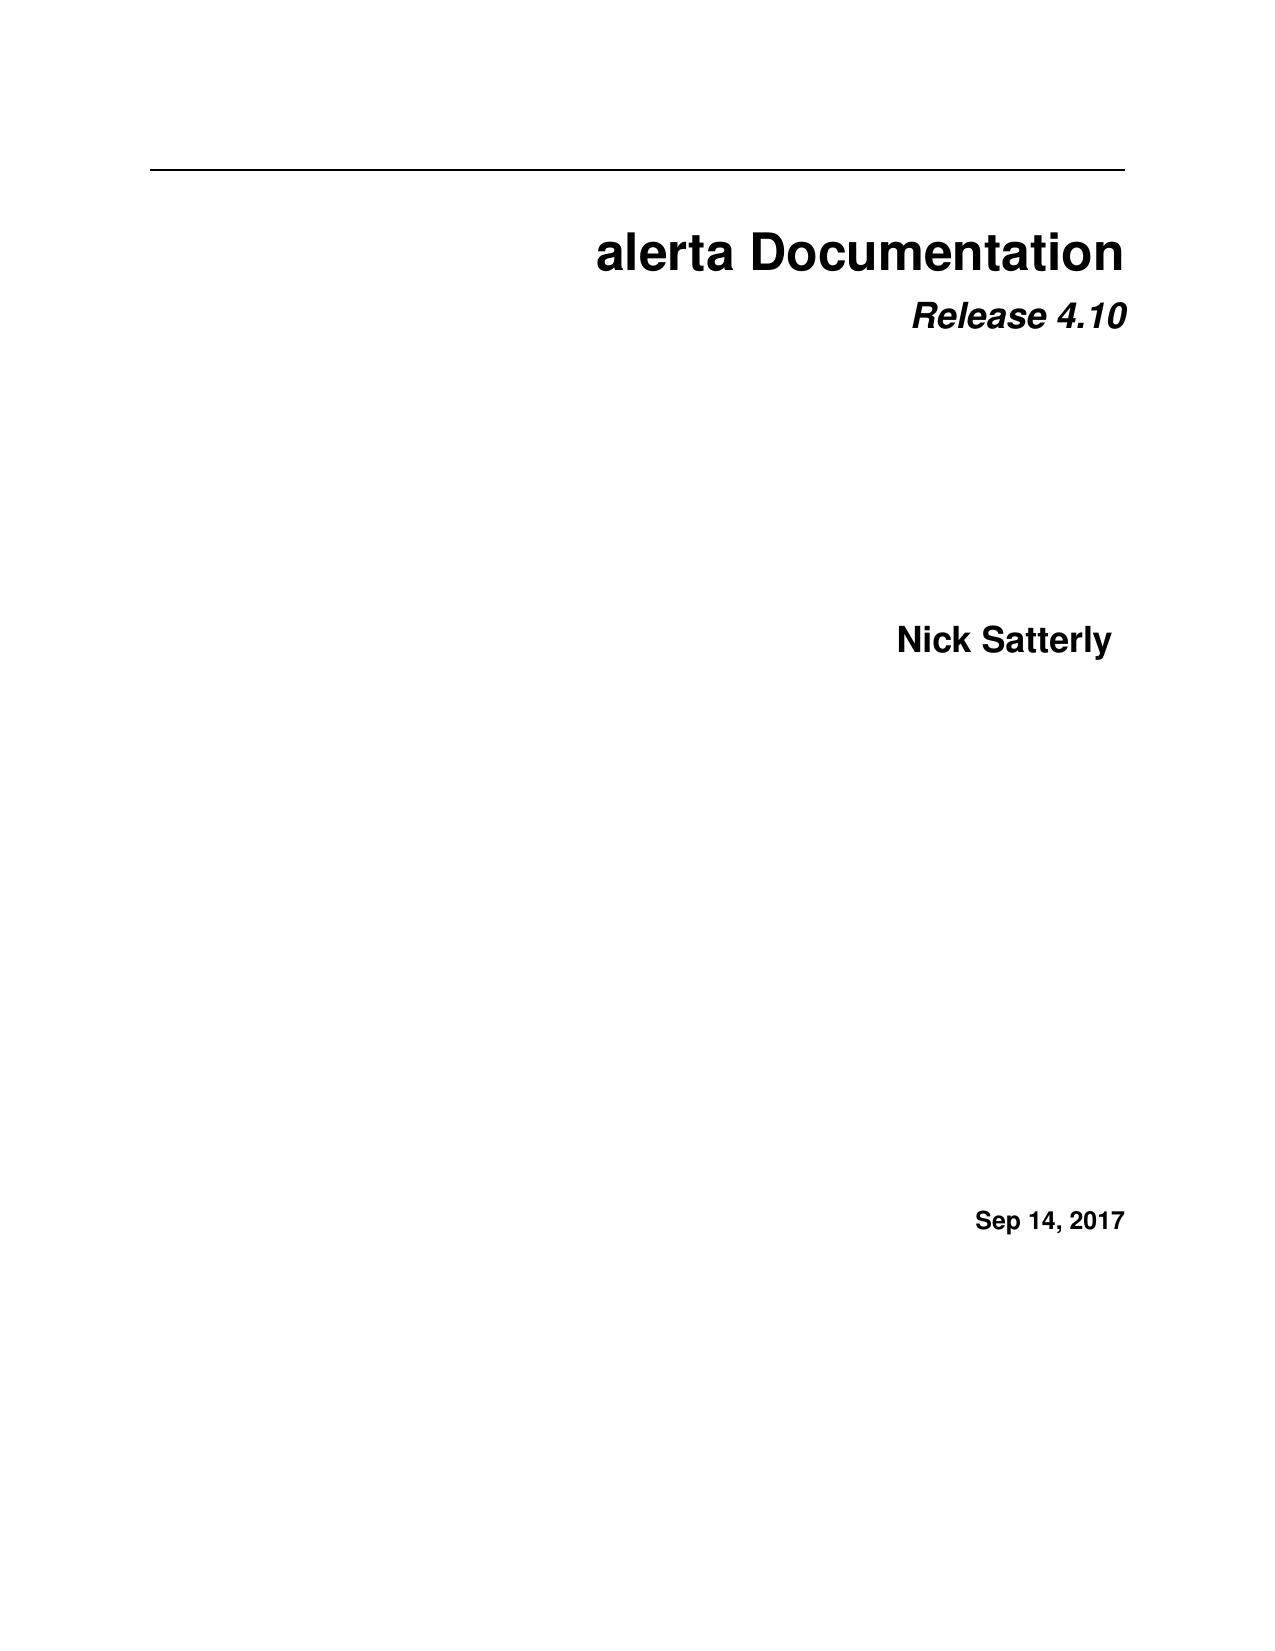 alerta Documentation   manualzz com